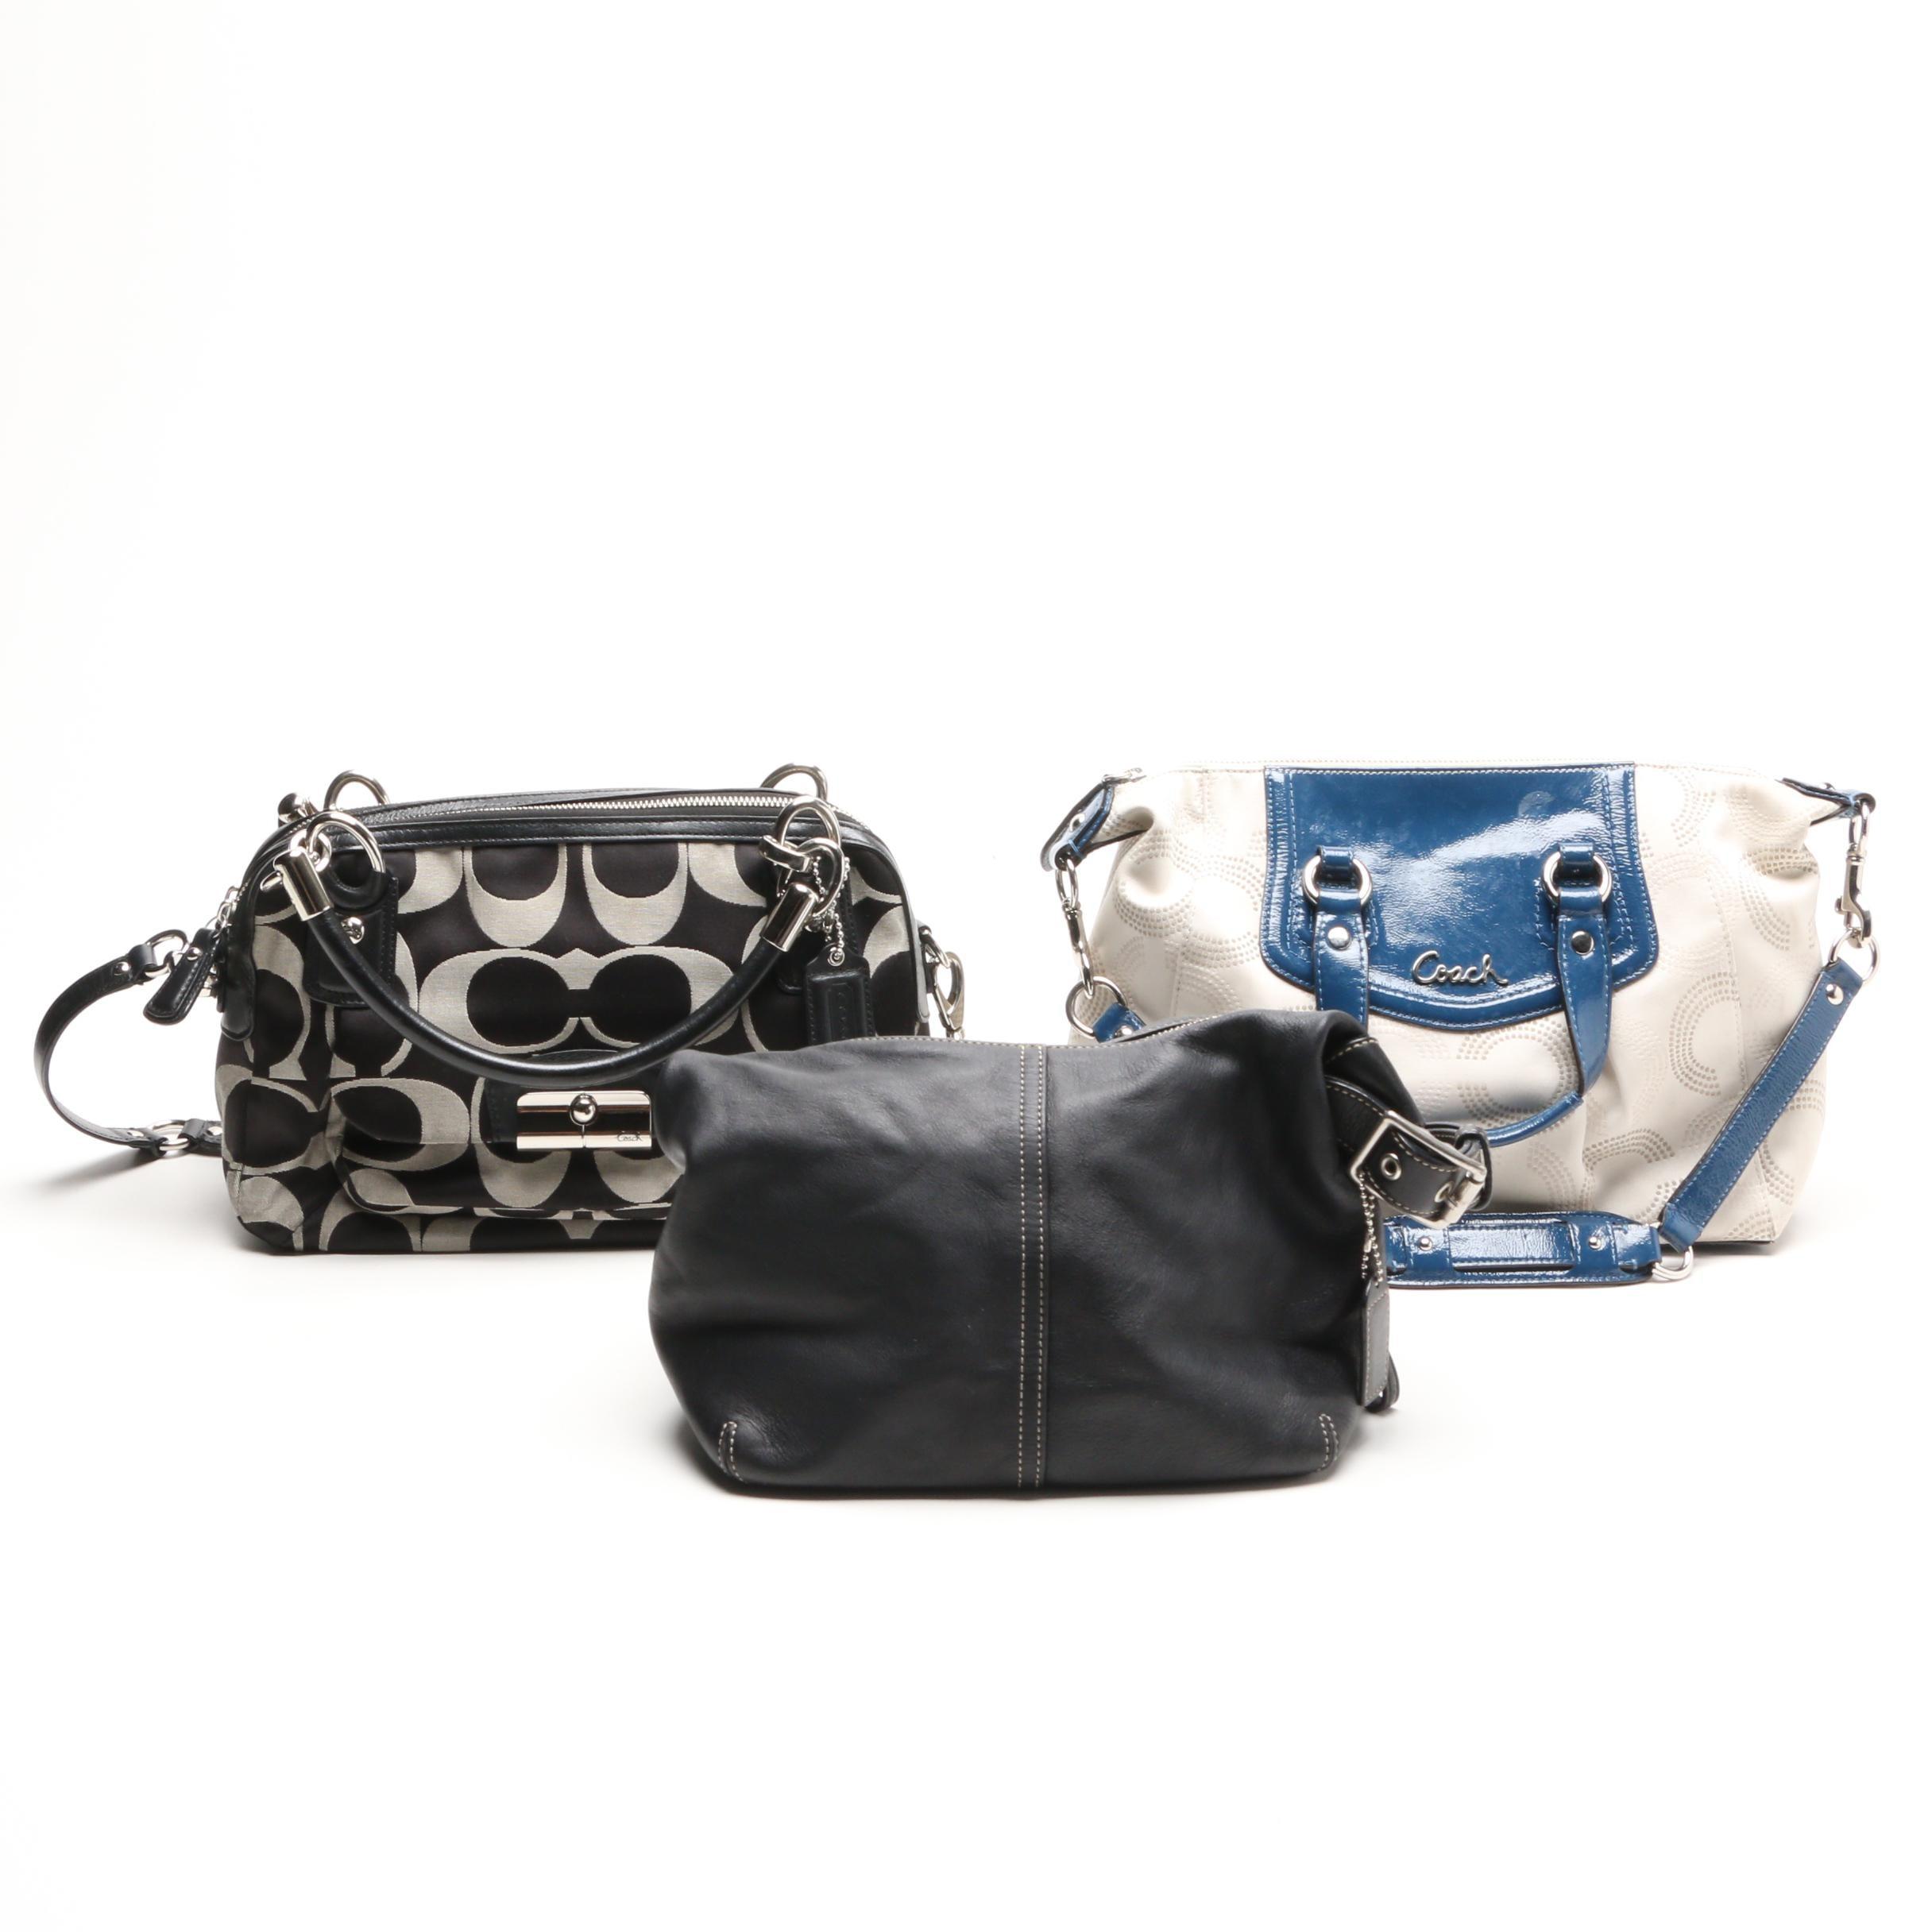 Coach Kristin Signature Double Zip Satchel and Other Handbags